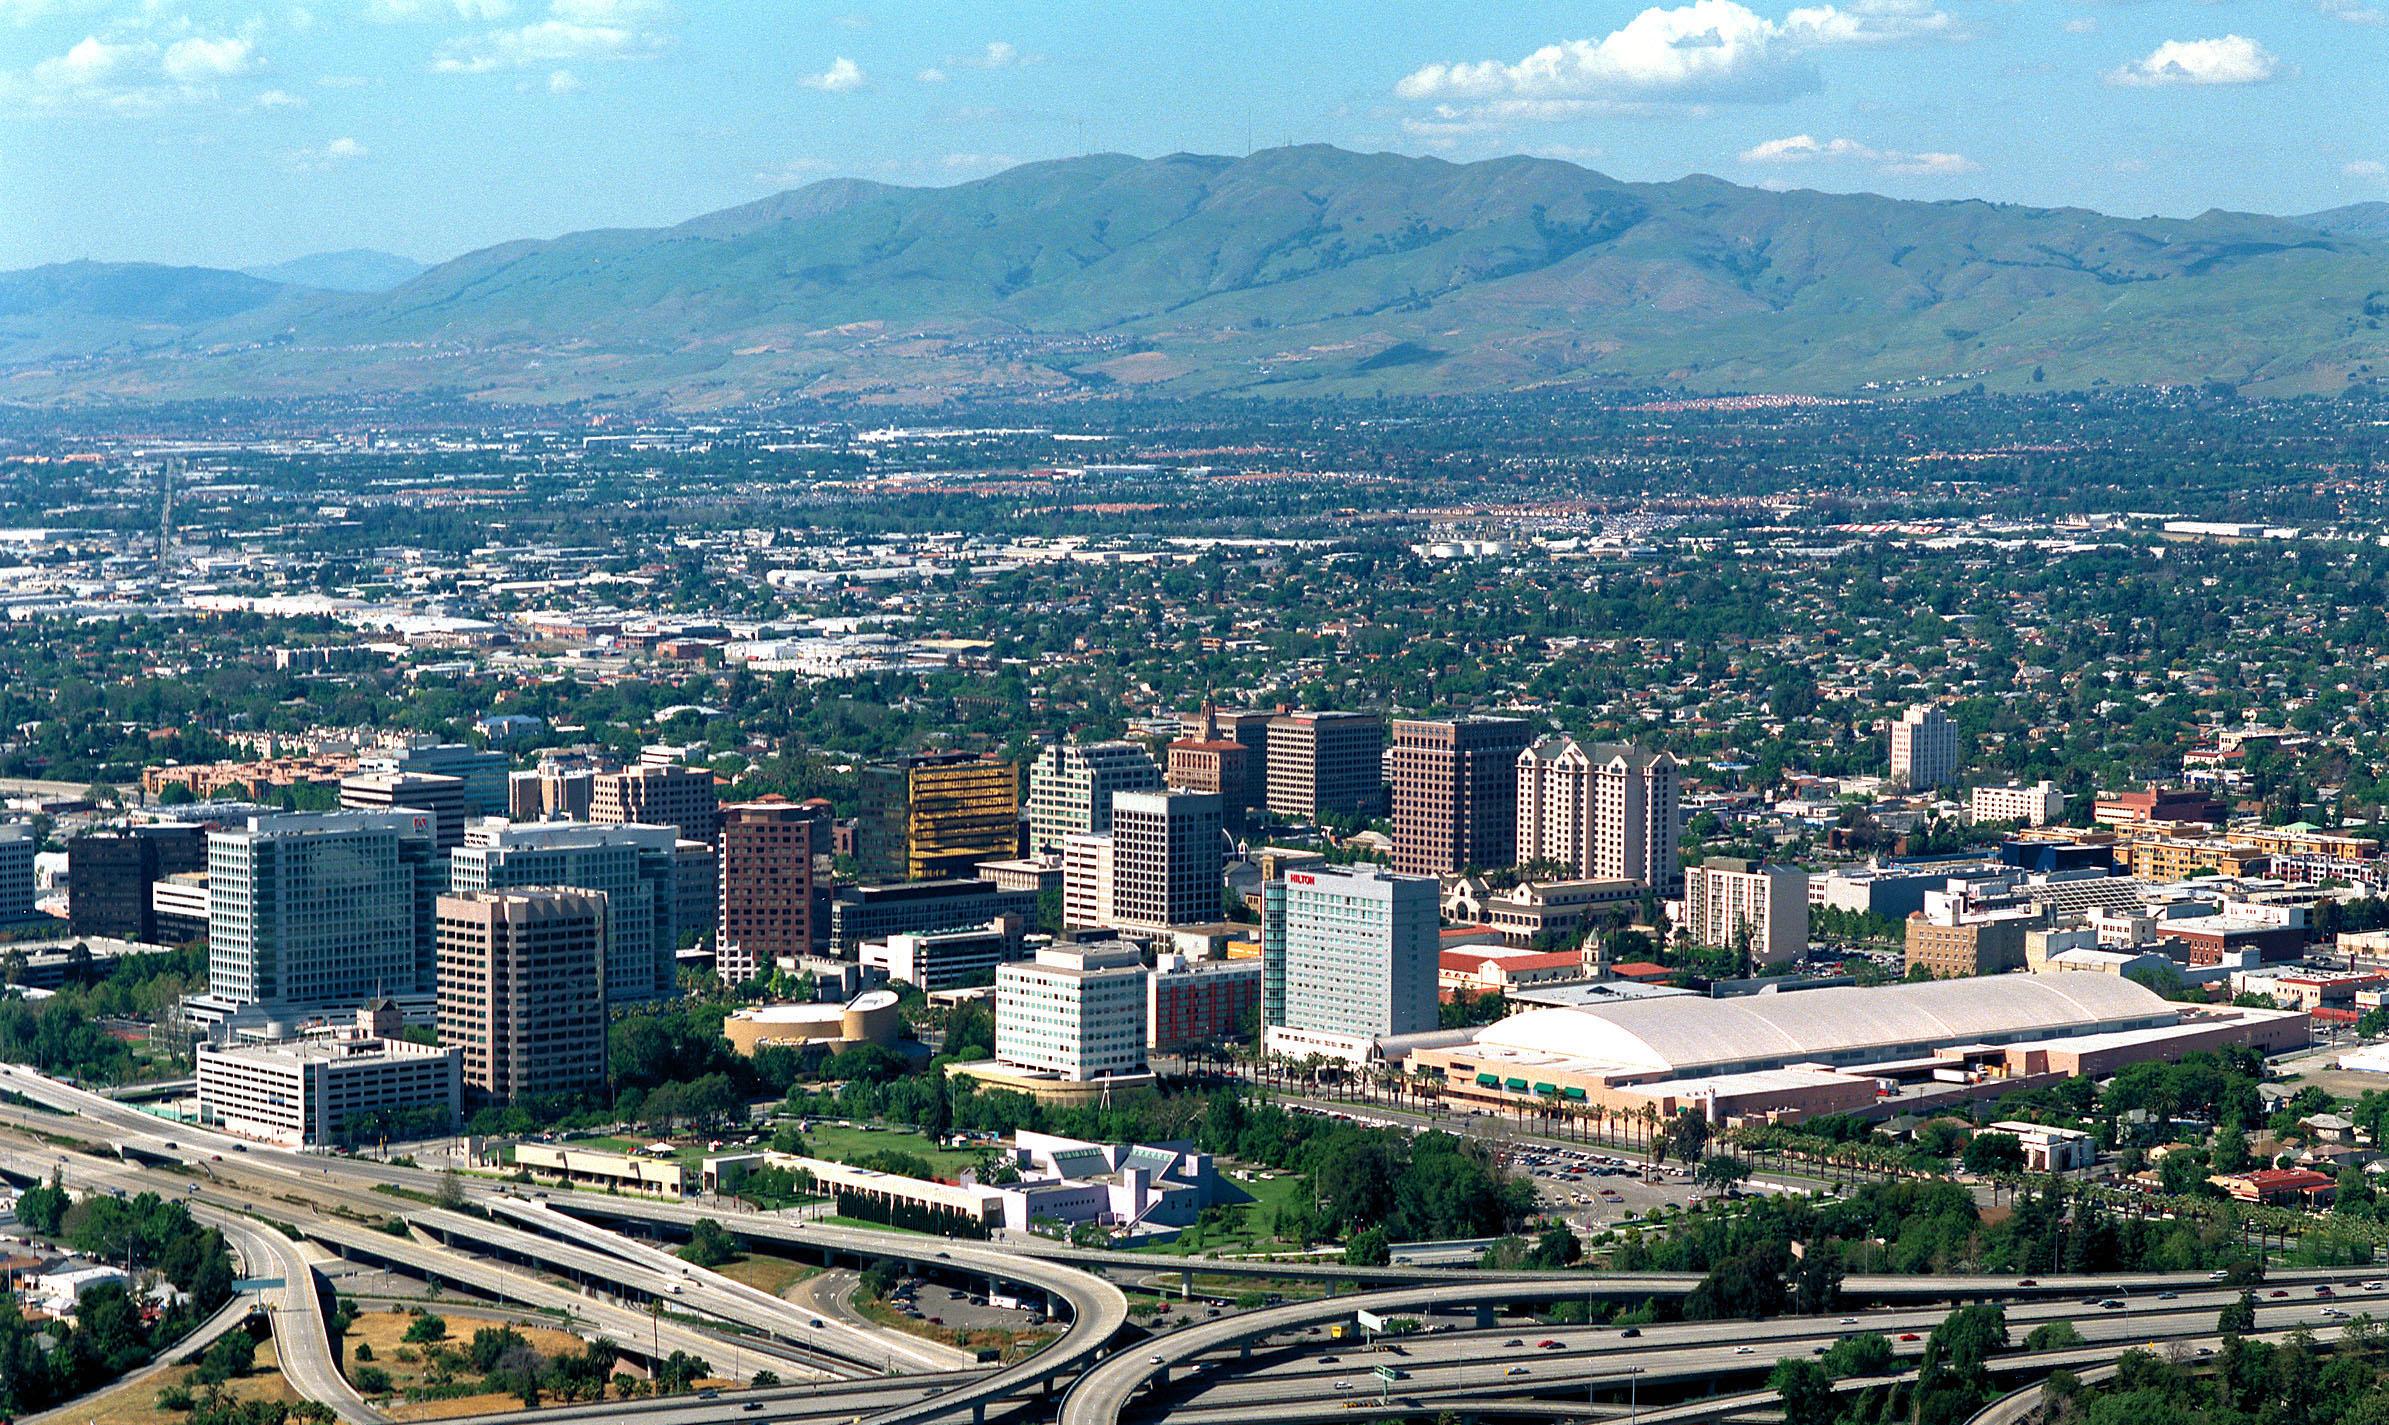 Aerial_downtownSJ.jpg